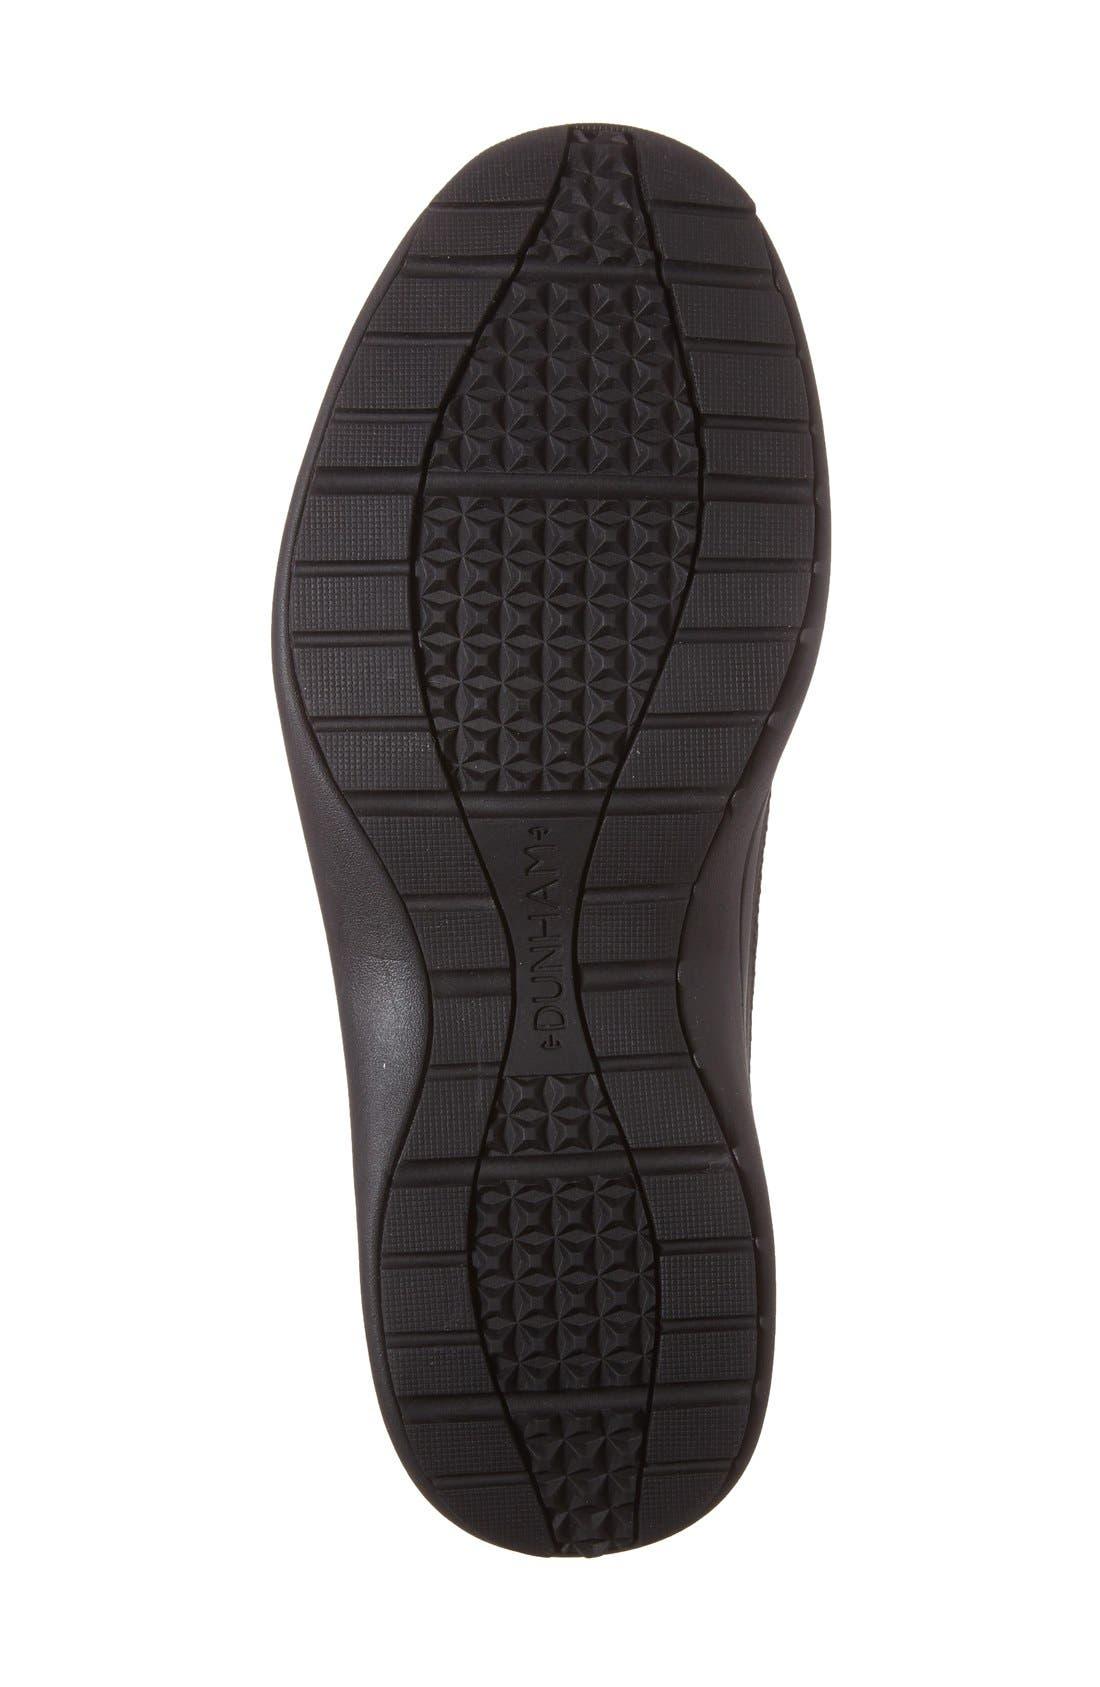 Simon-Dun Waterproof Boot,                             Alternate thumbnail 4, color,                             Black Leather